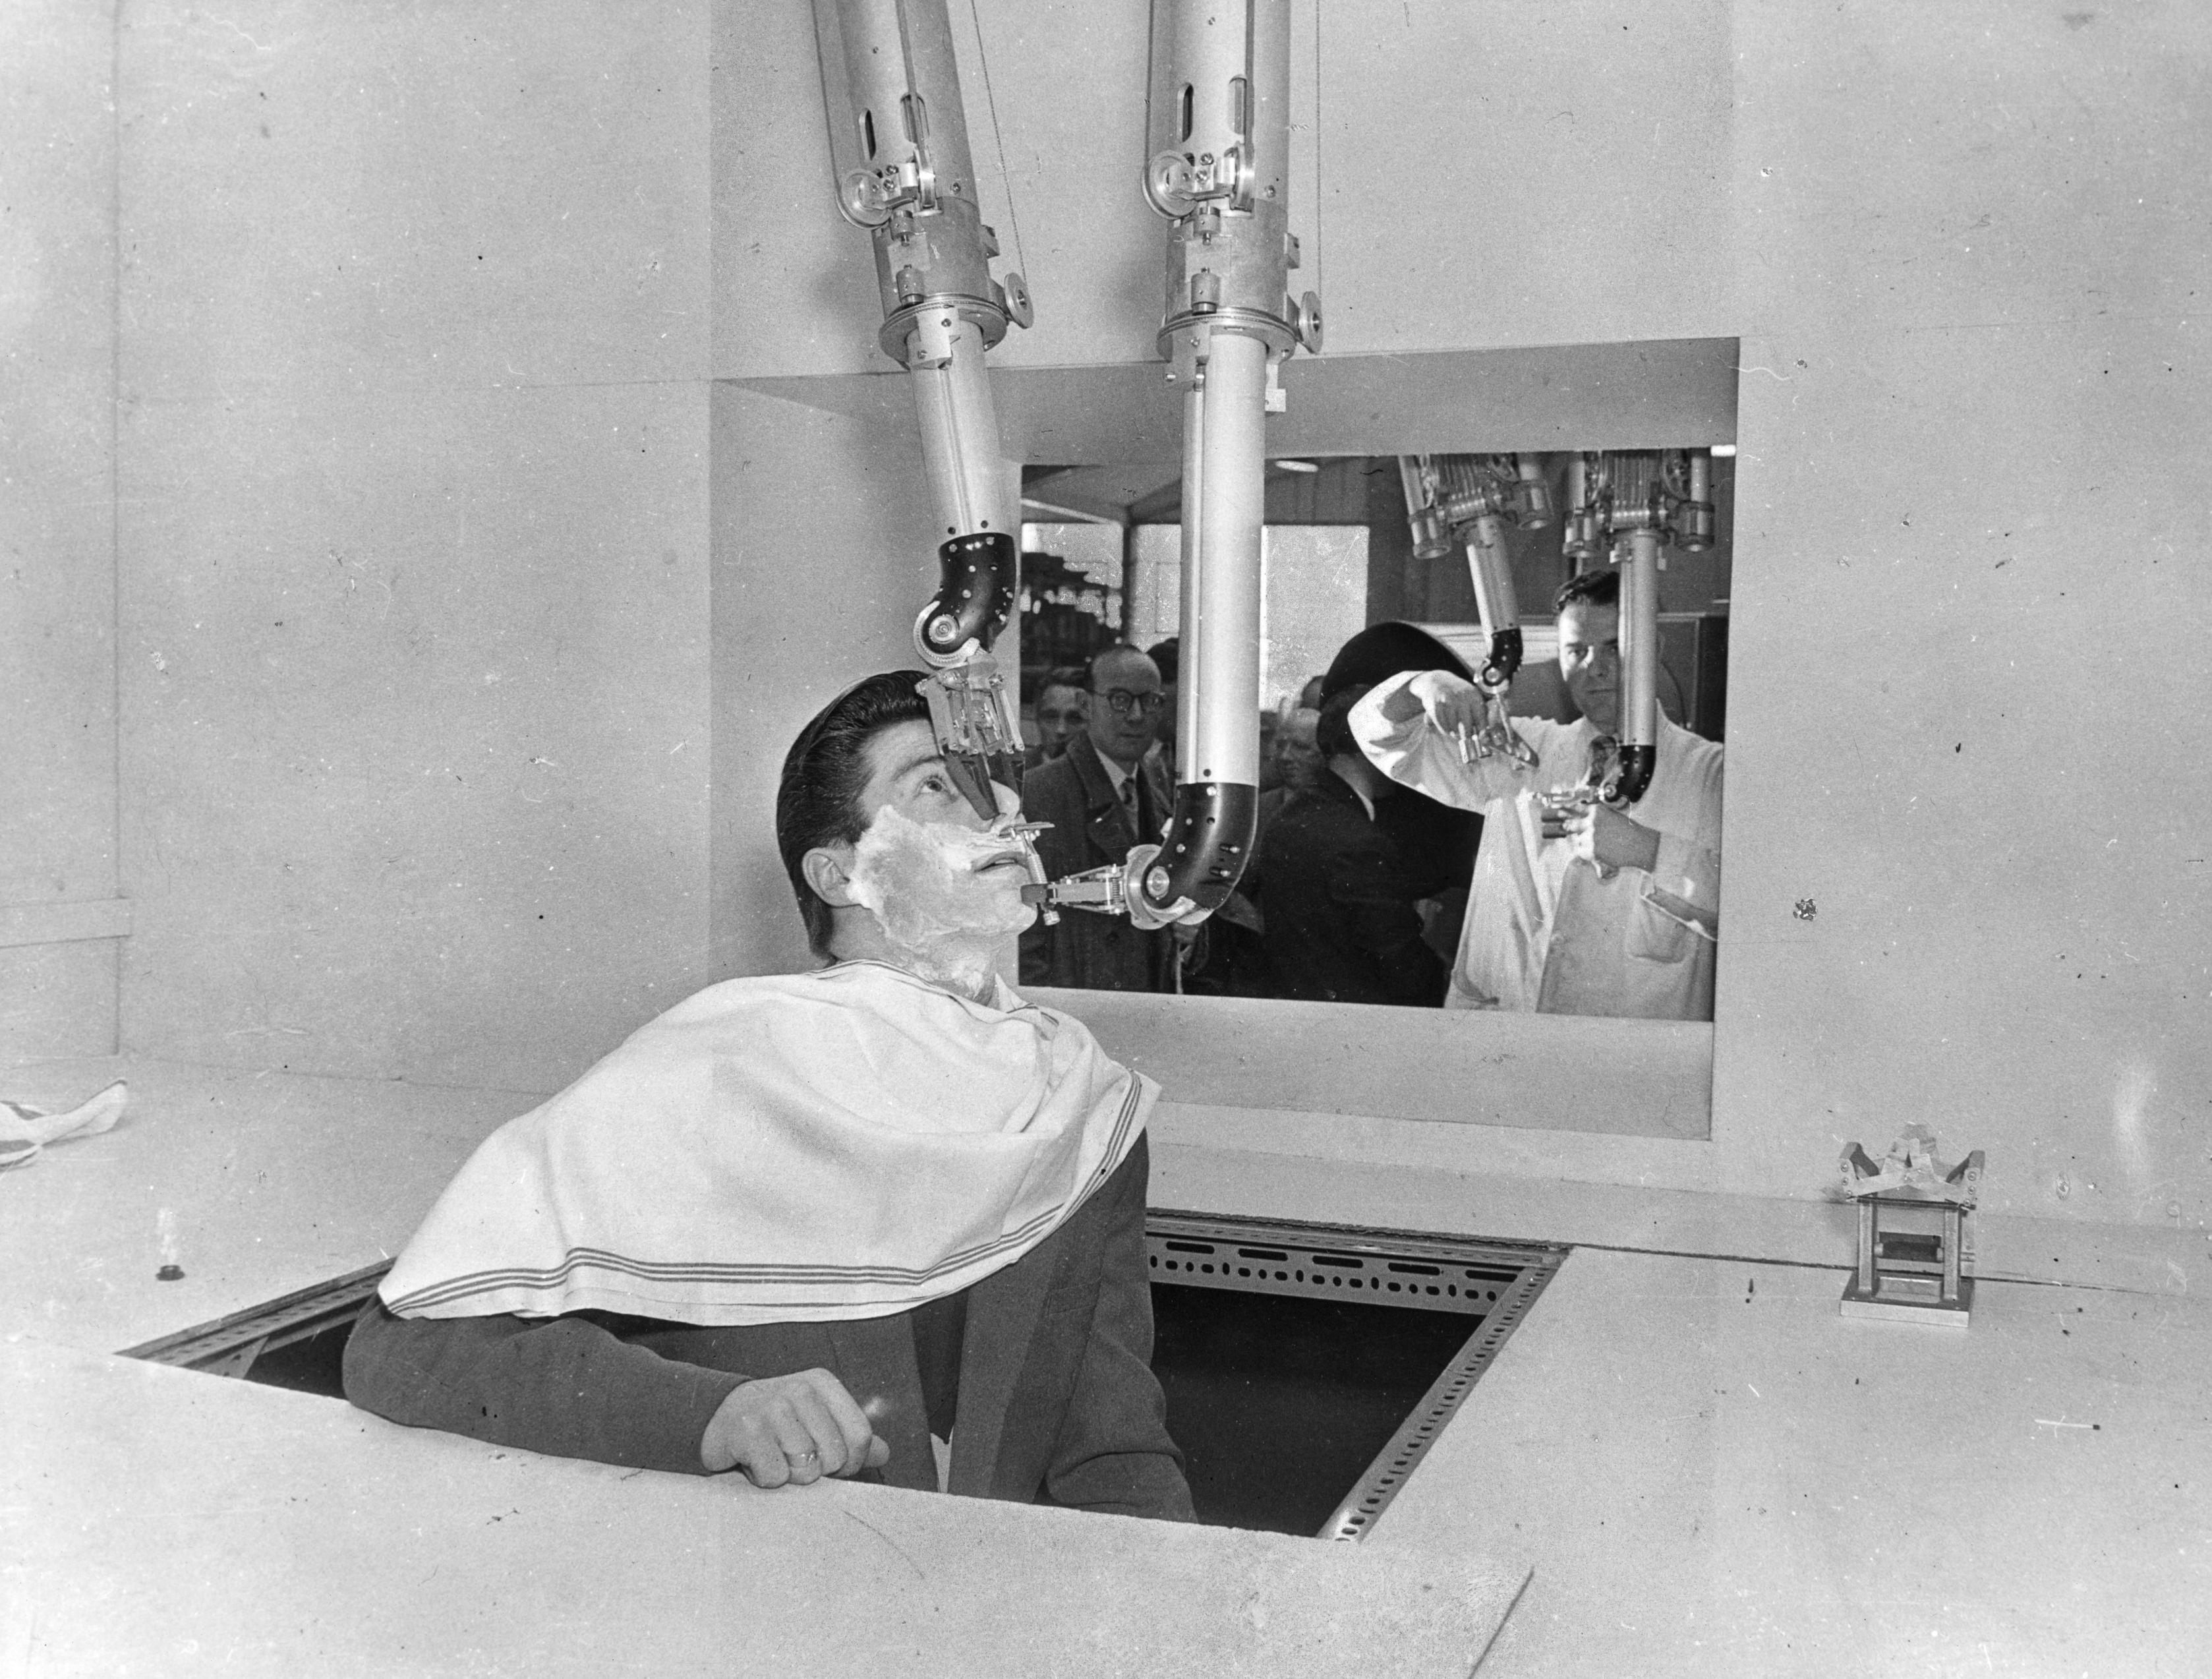 1950s Robotic Shaver